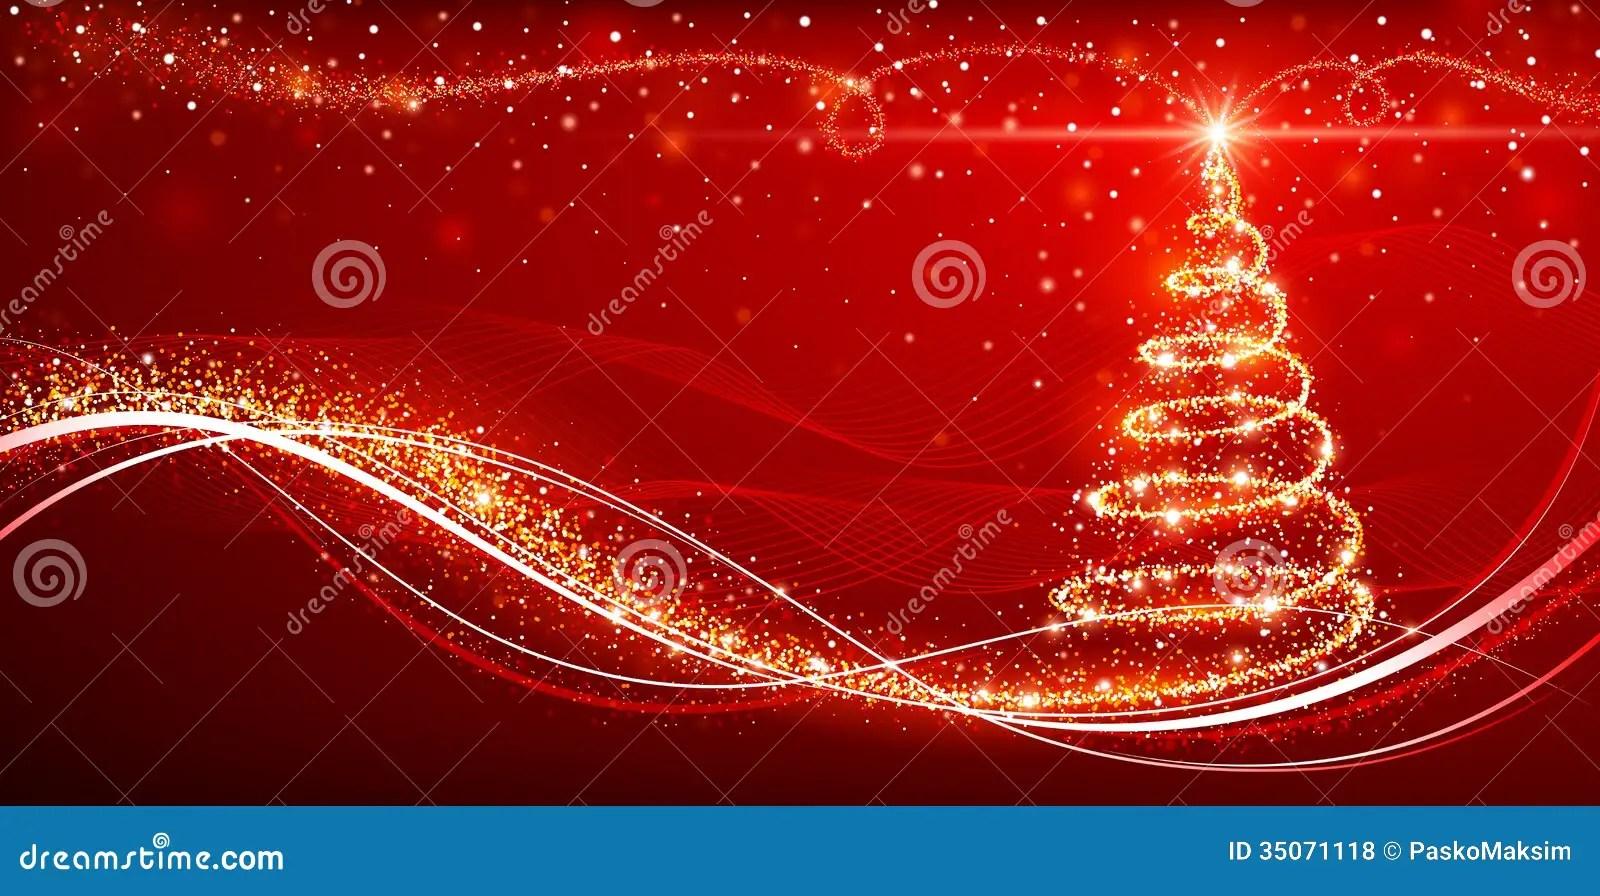 Magic Christmas Tree Royalty Free Stock Photos Image